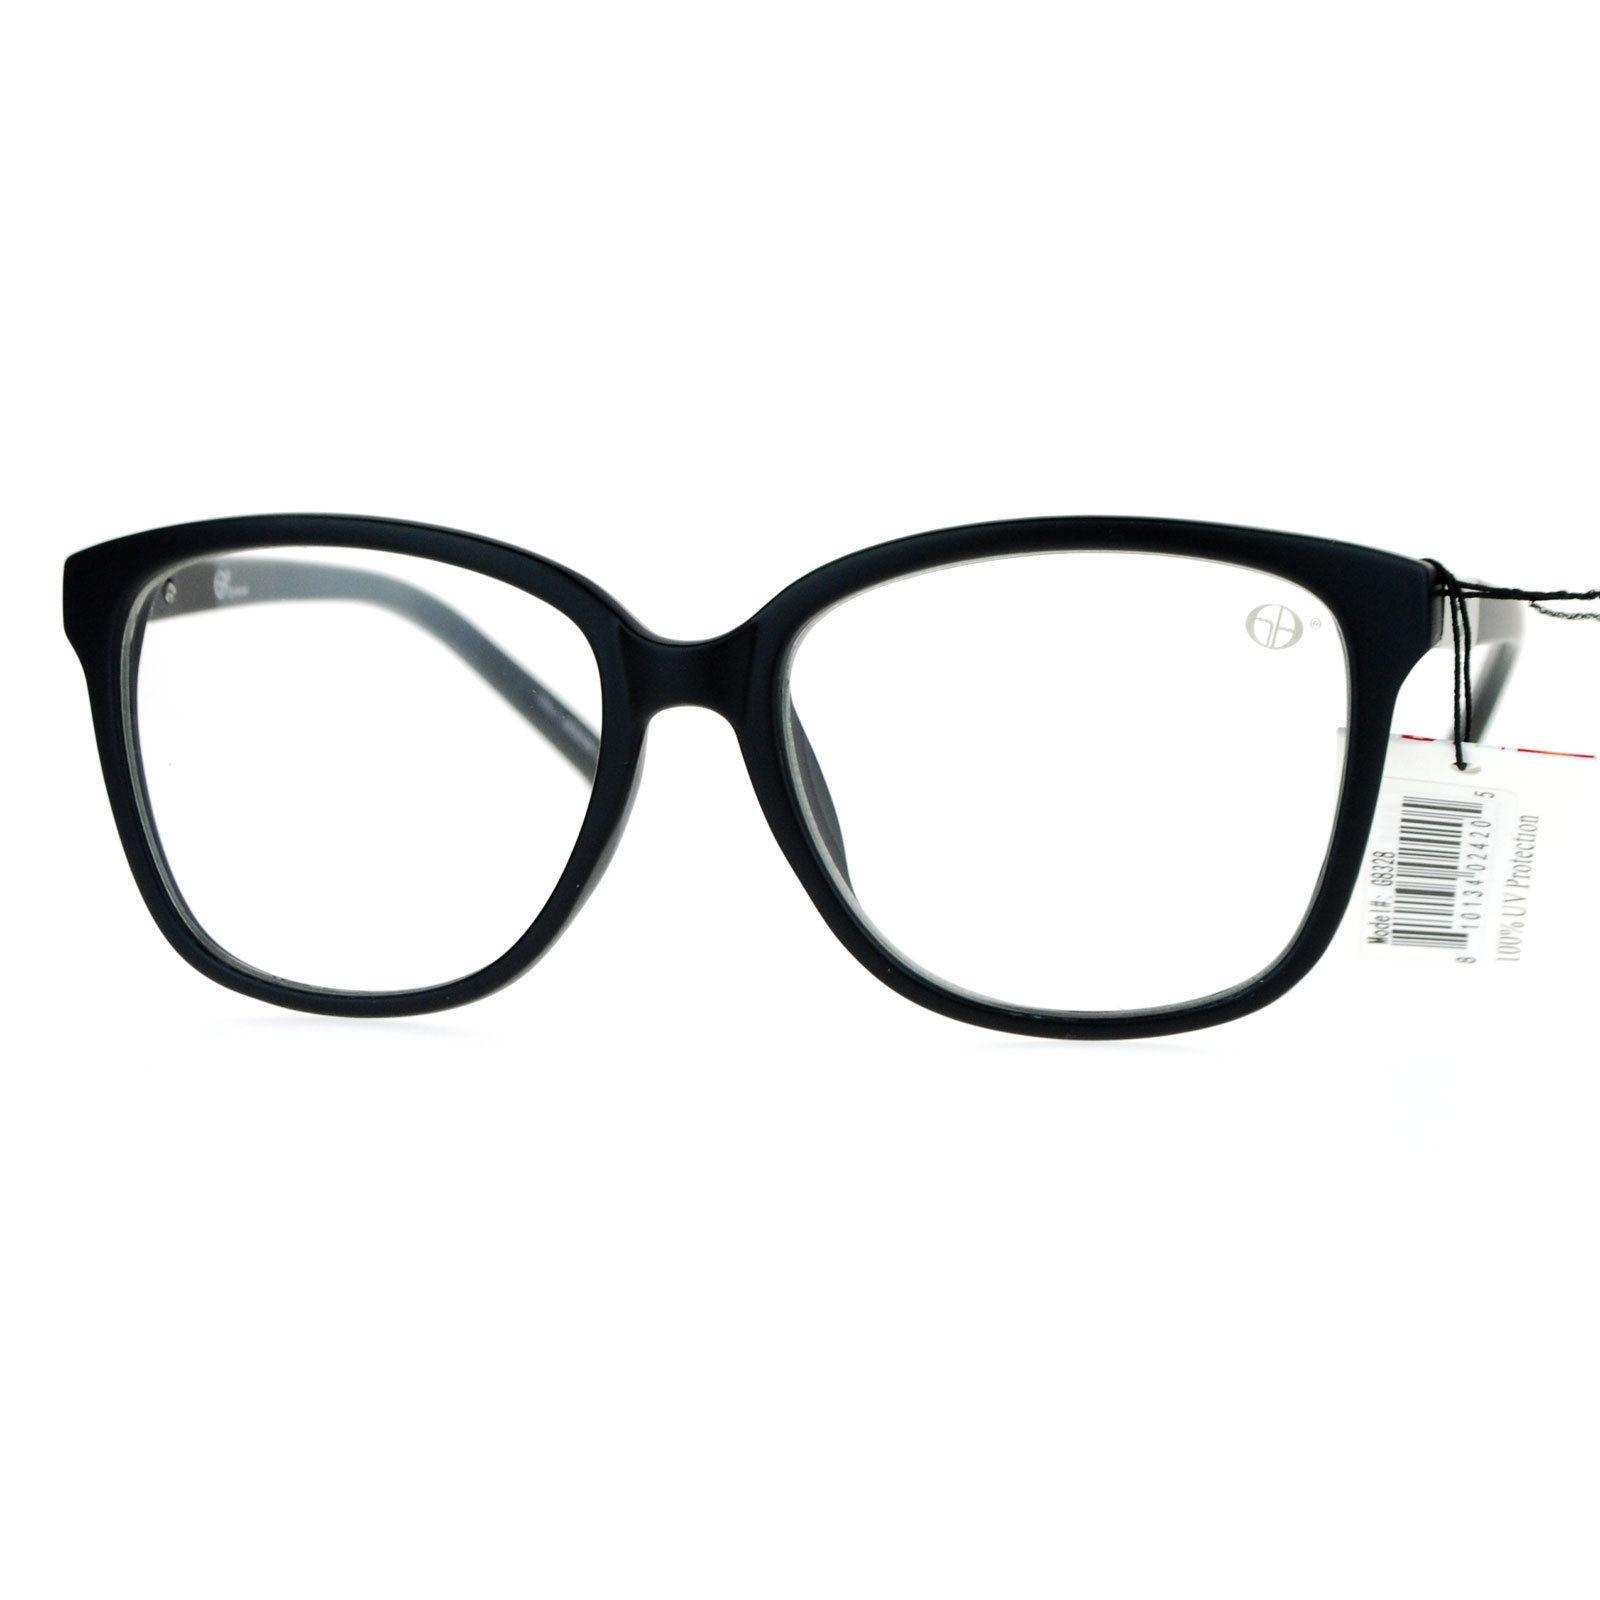 Designer Fashion Clear Lens Glasses Stylish Square Frame UV 400